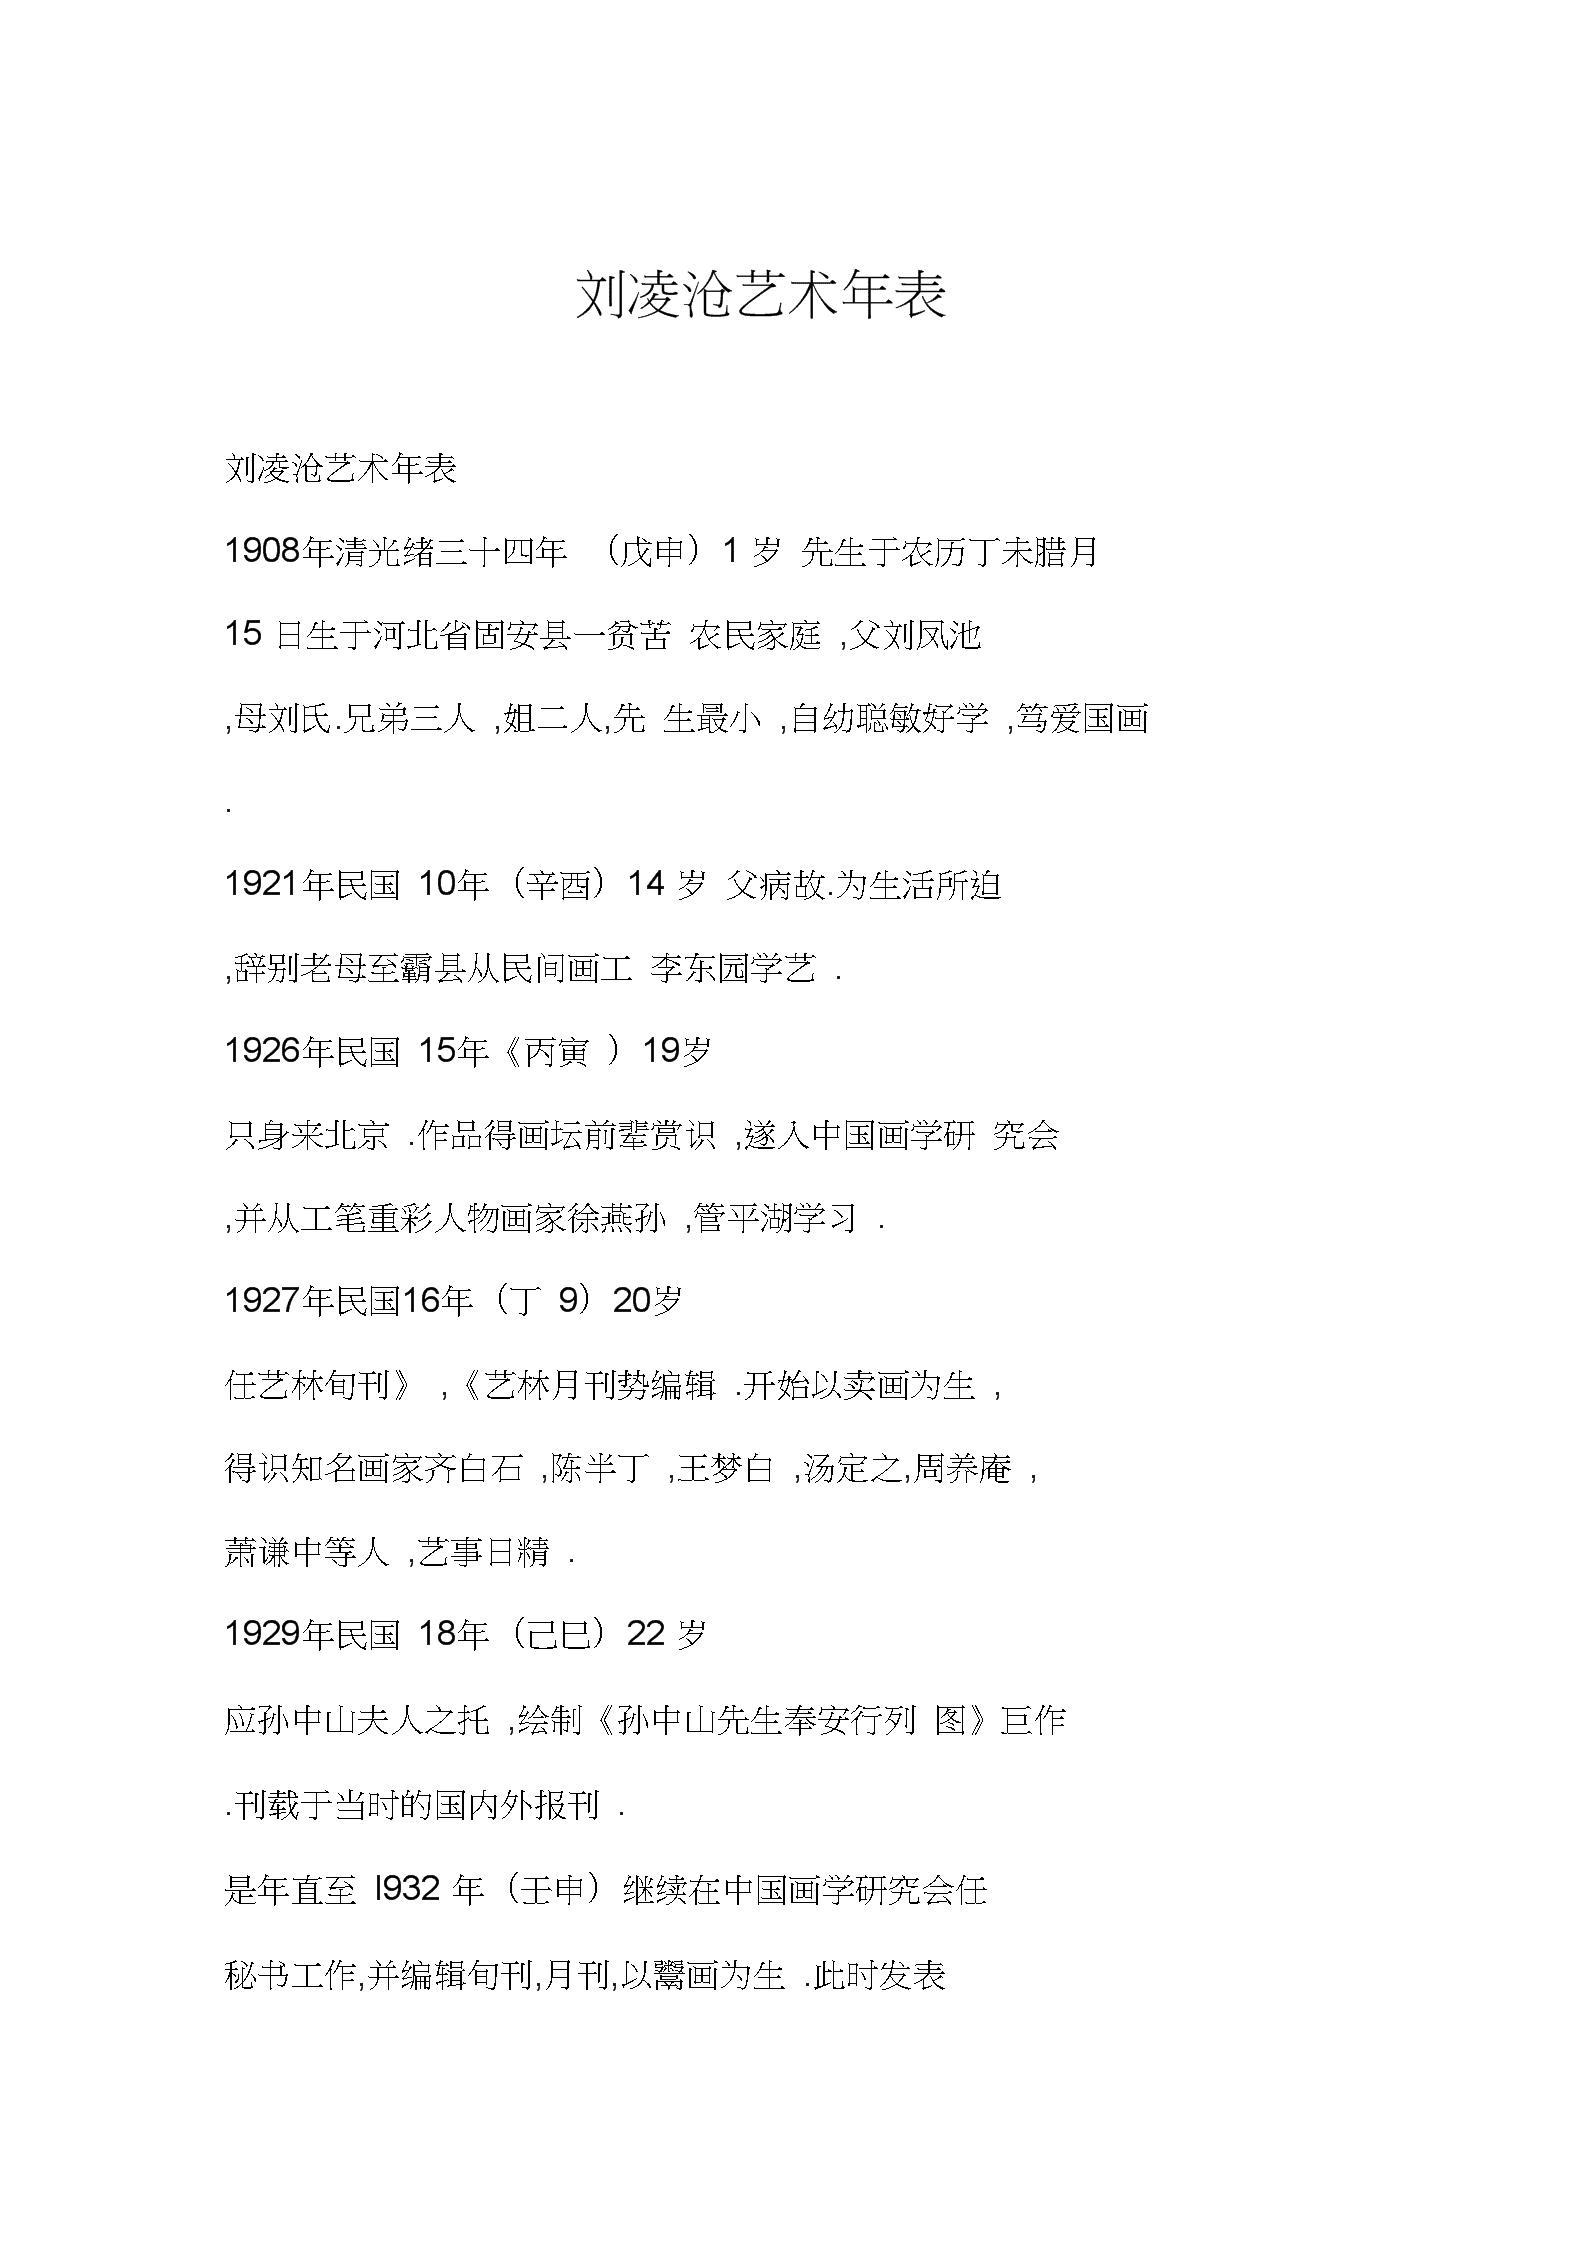 【word】刘凌沧艺术年表.docx